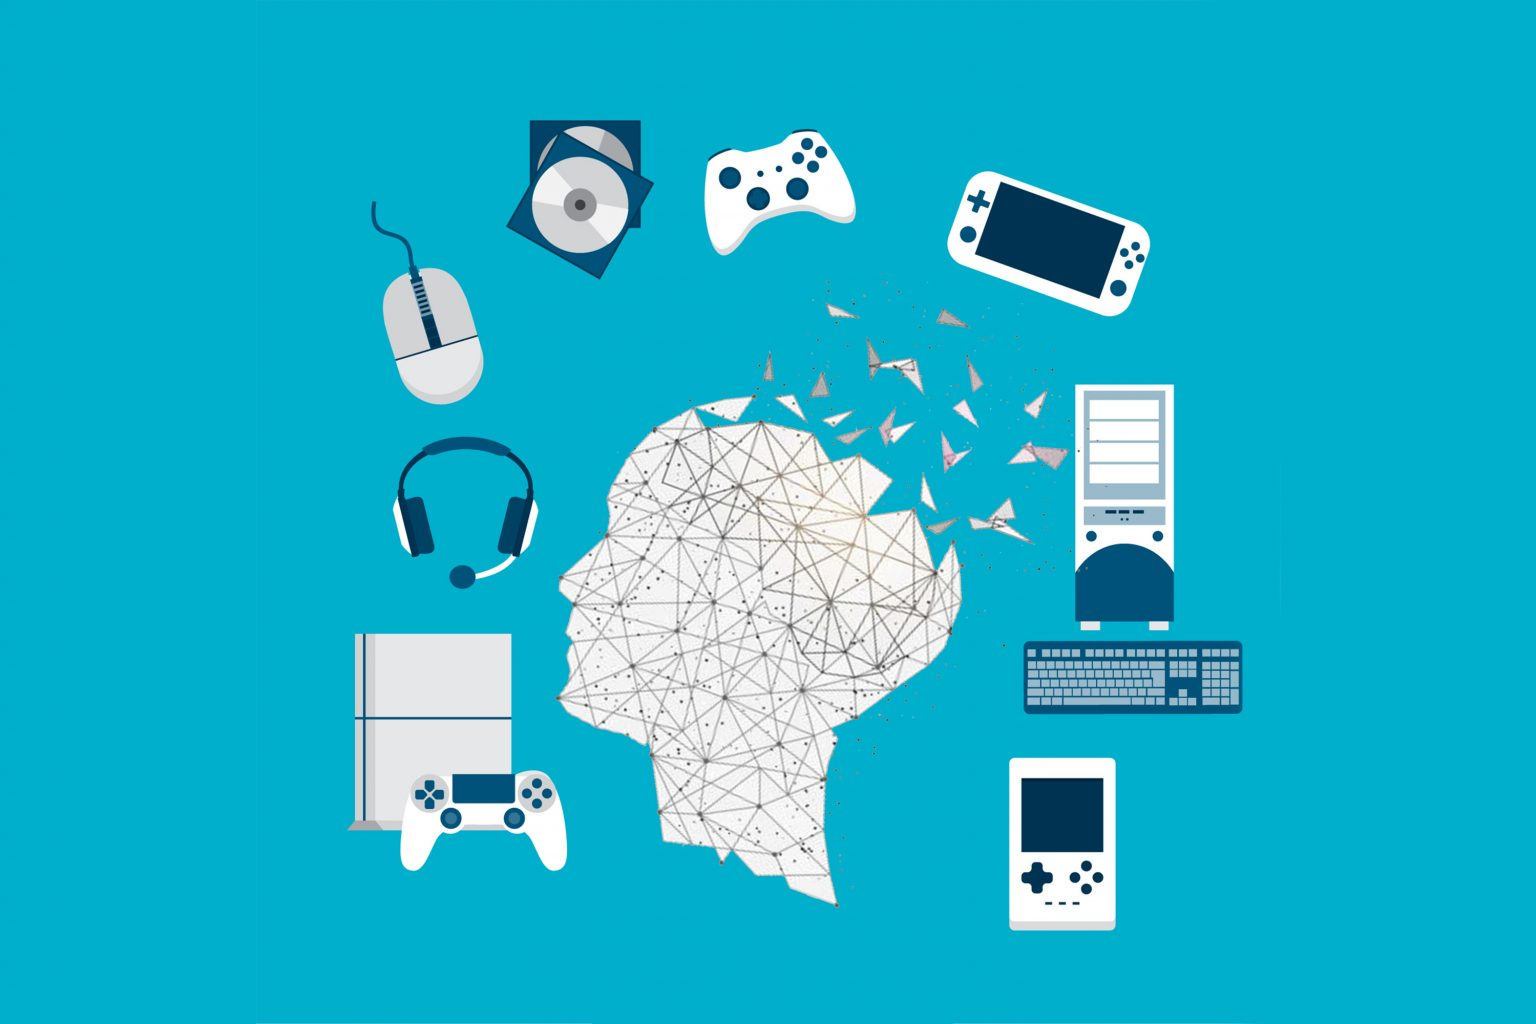 Esports_Brain_ED-1-1024x683@2x (2)